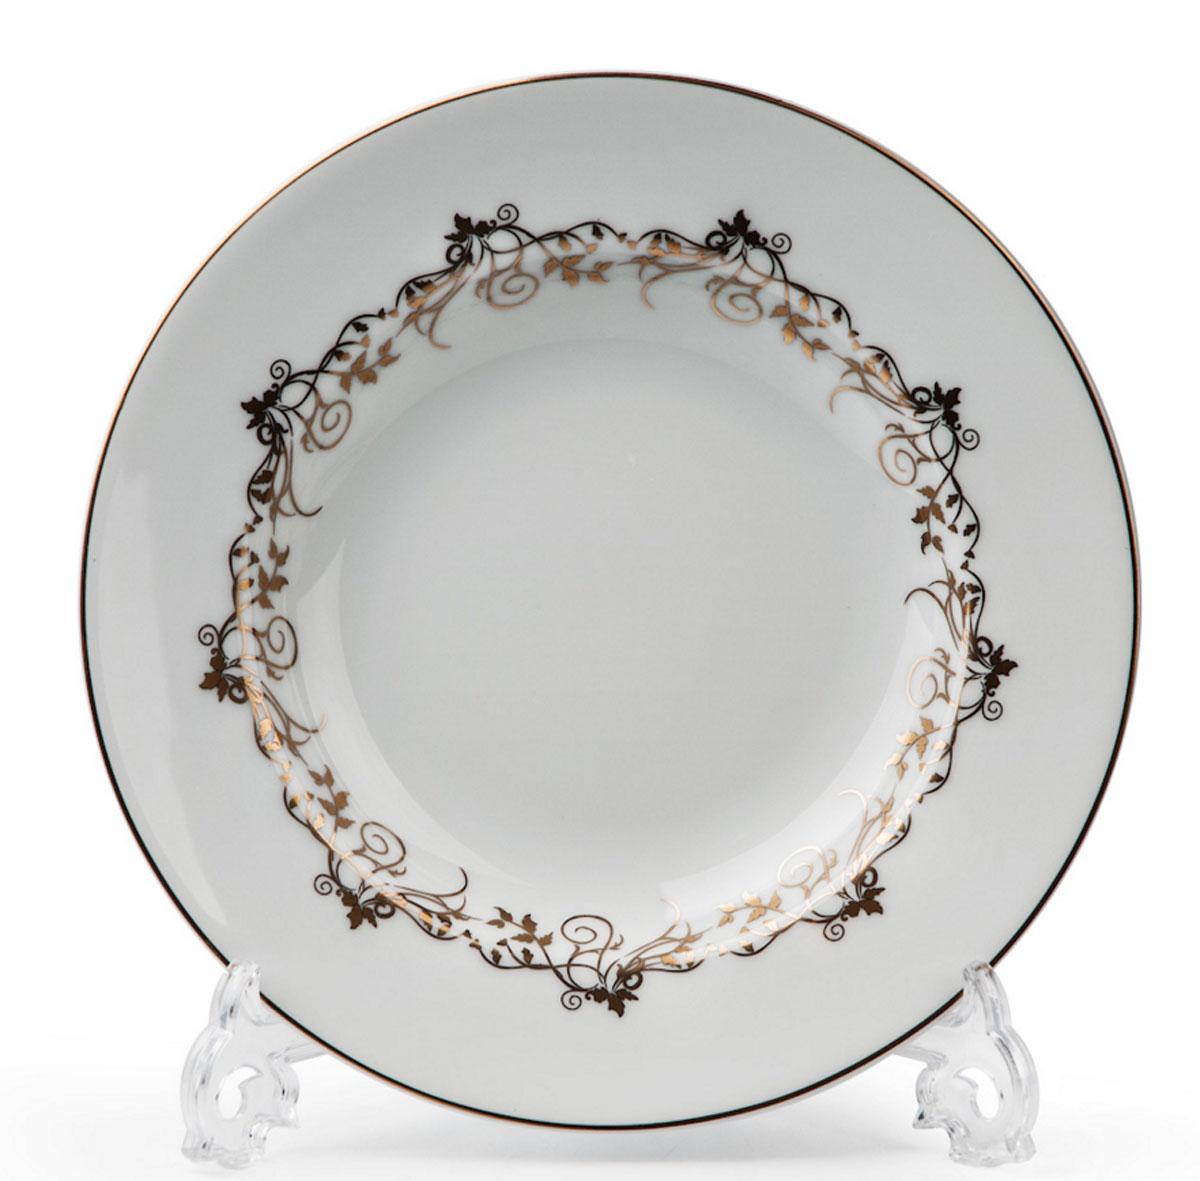 Mimosa Lierre Or 947, набор тарелок глубоких (6шт), цвет: белый с золотом539124947В наборе глубокая тарелка 6 штук Материал: фарфор: цвет: белый с золотомСерия: MIMOSA